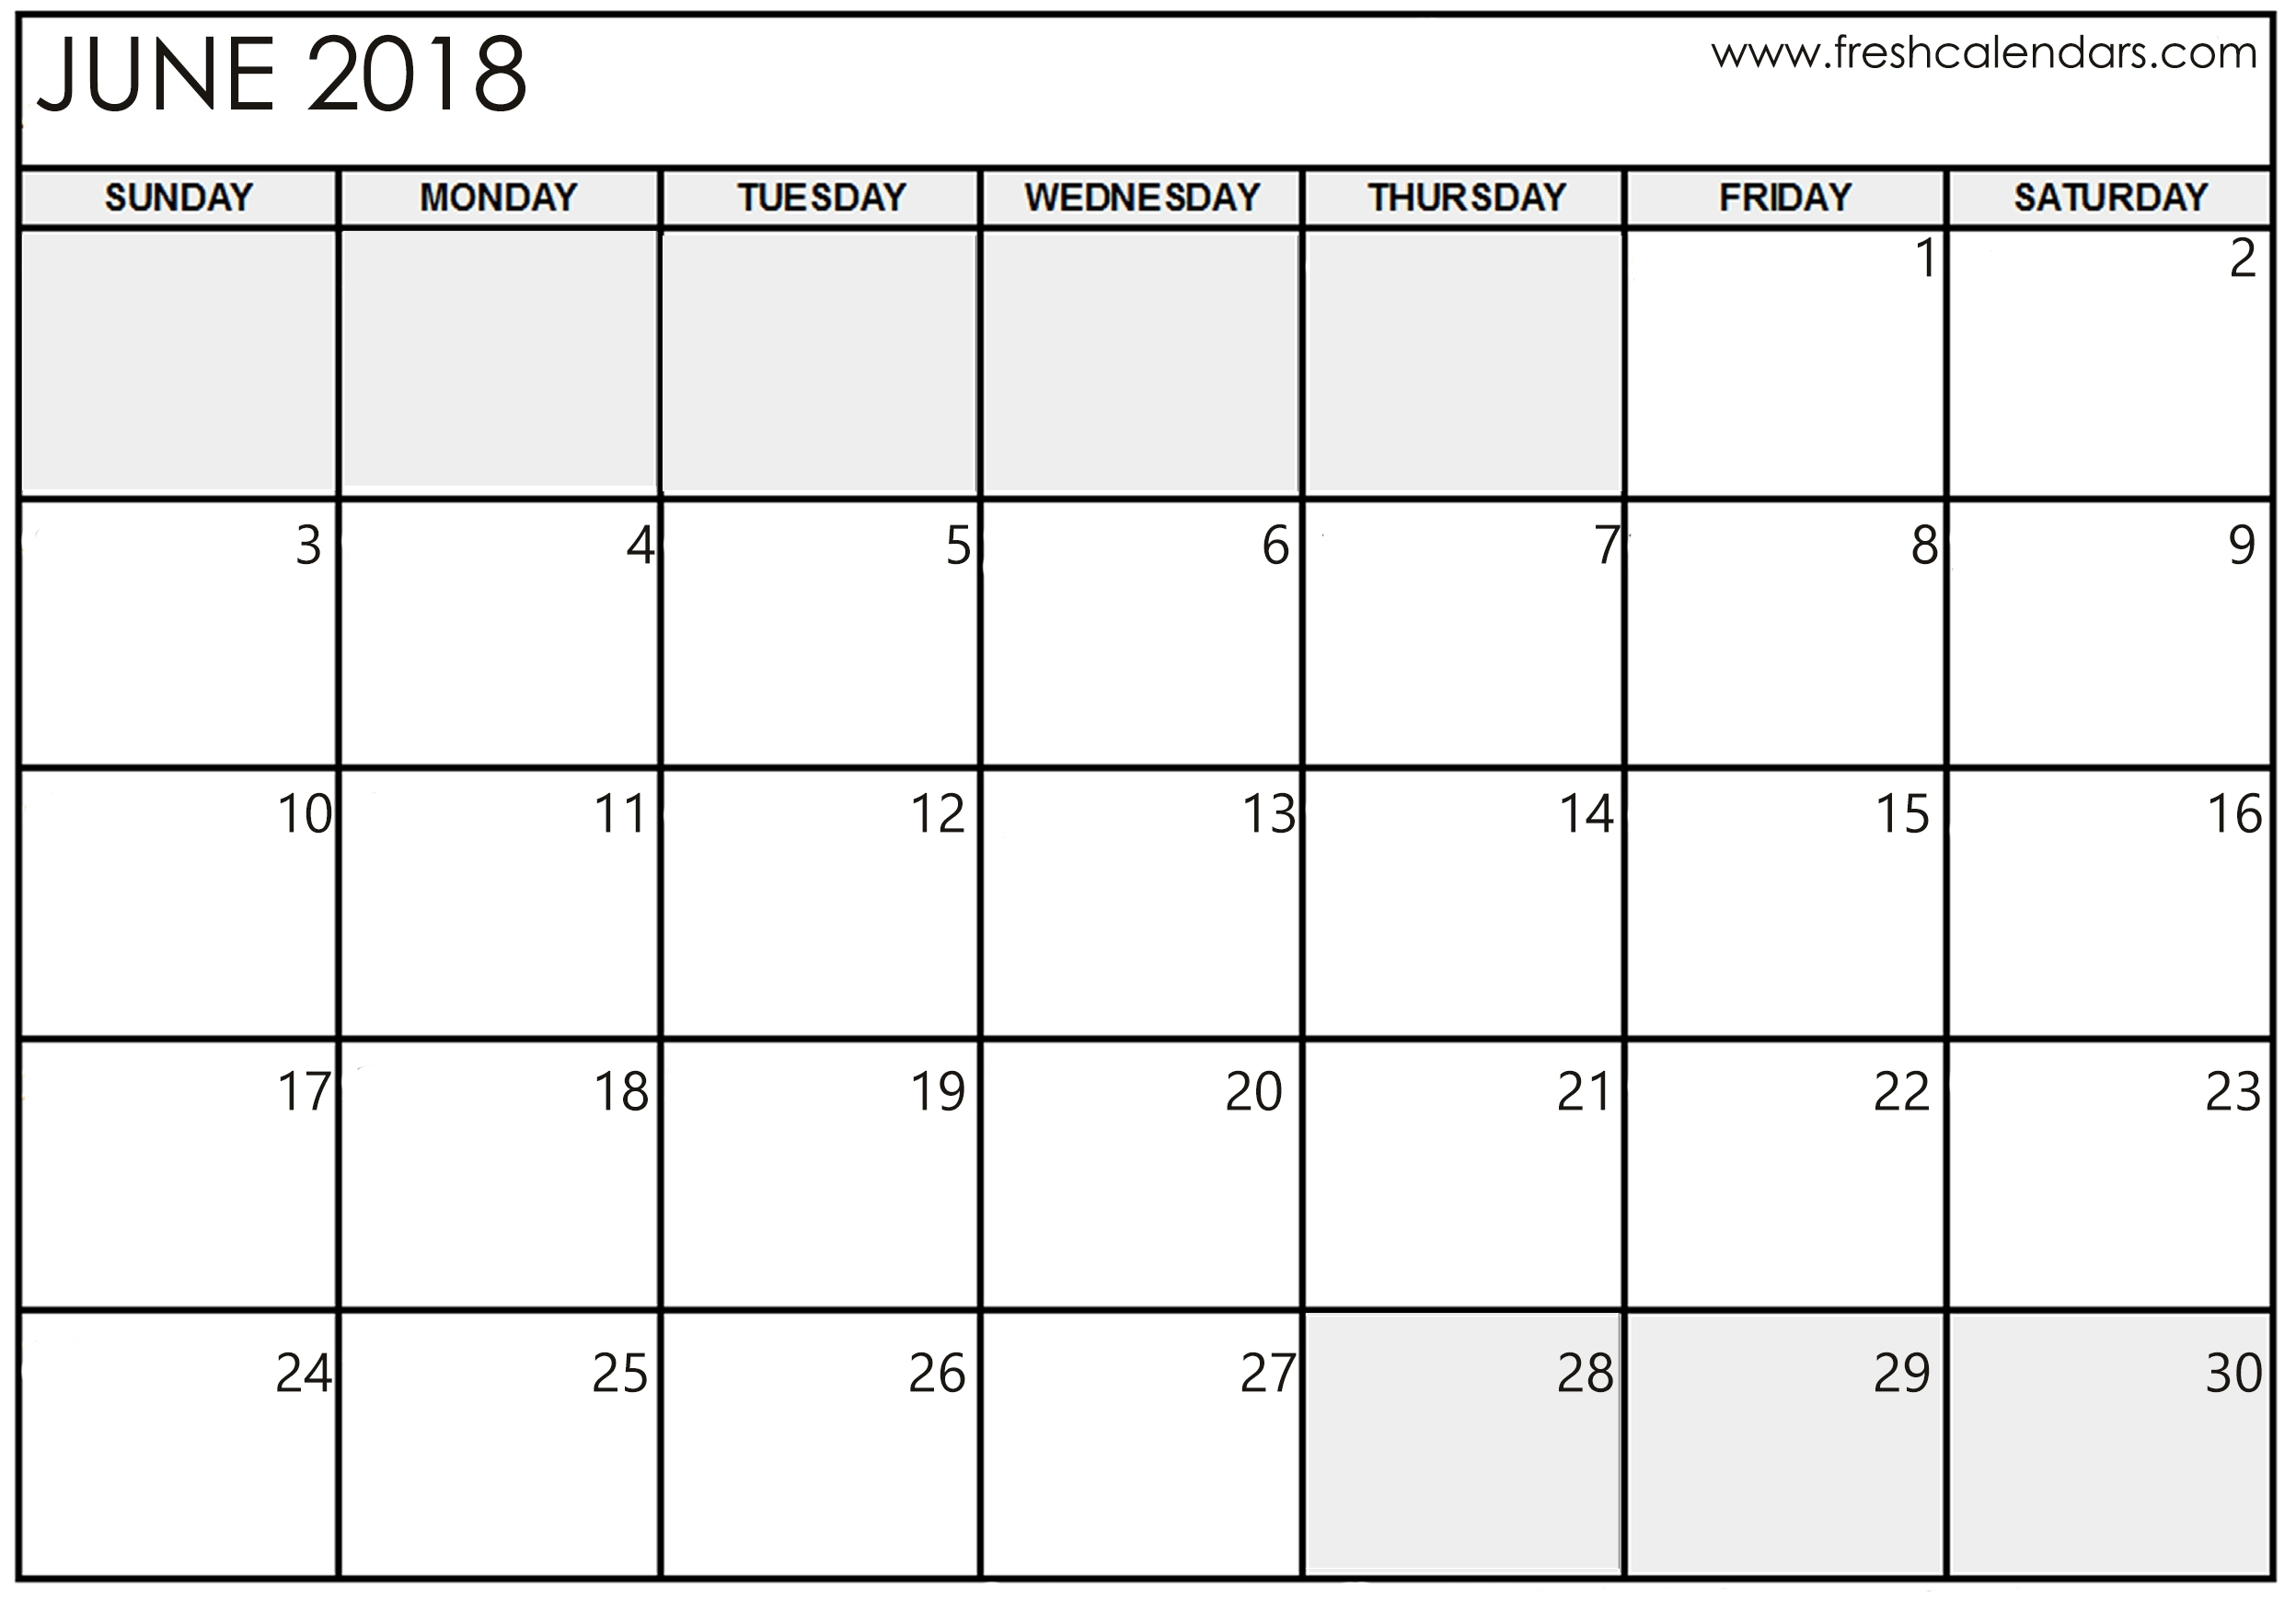 June 2018 Calendar Printable - Fresh Calendars inside June And July Calendar Printable